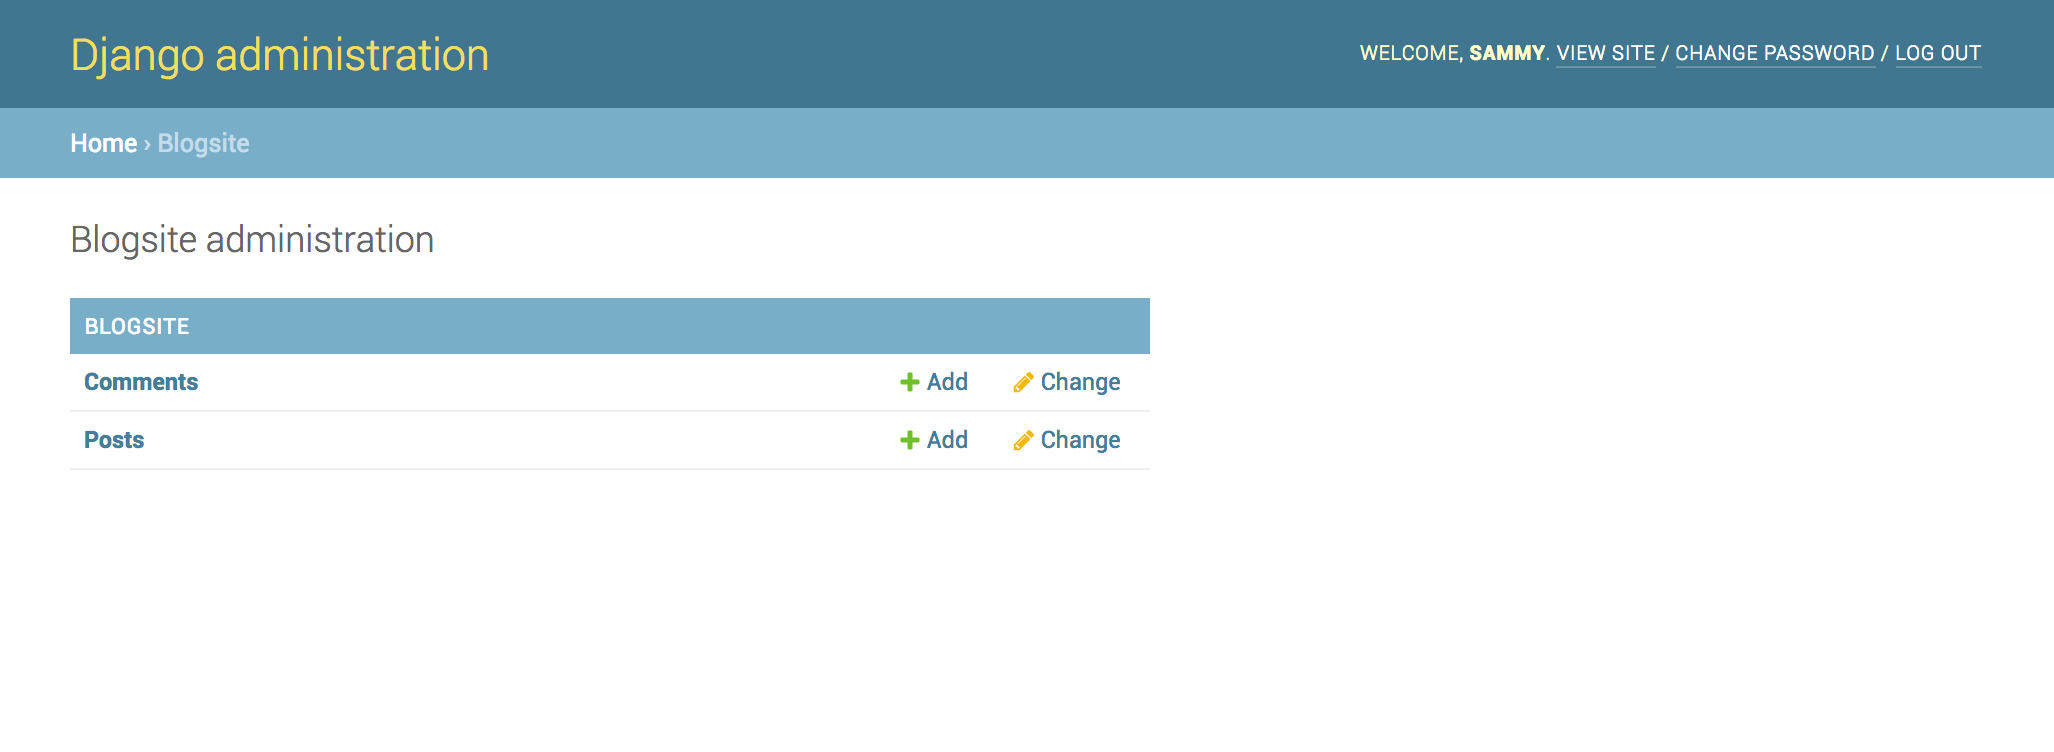 Django Blogsite Admin Page